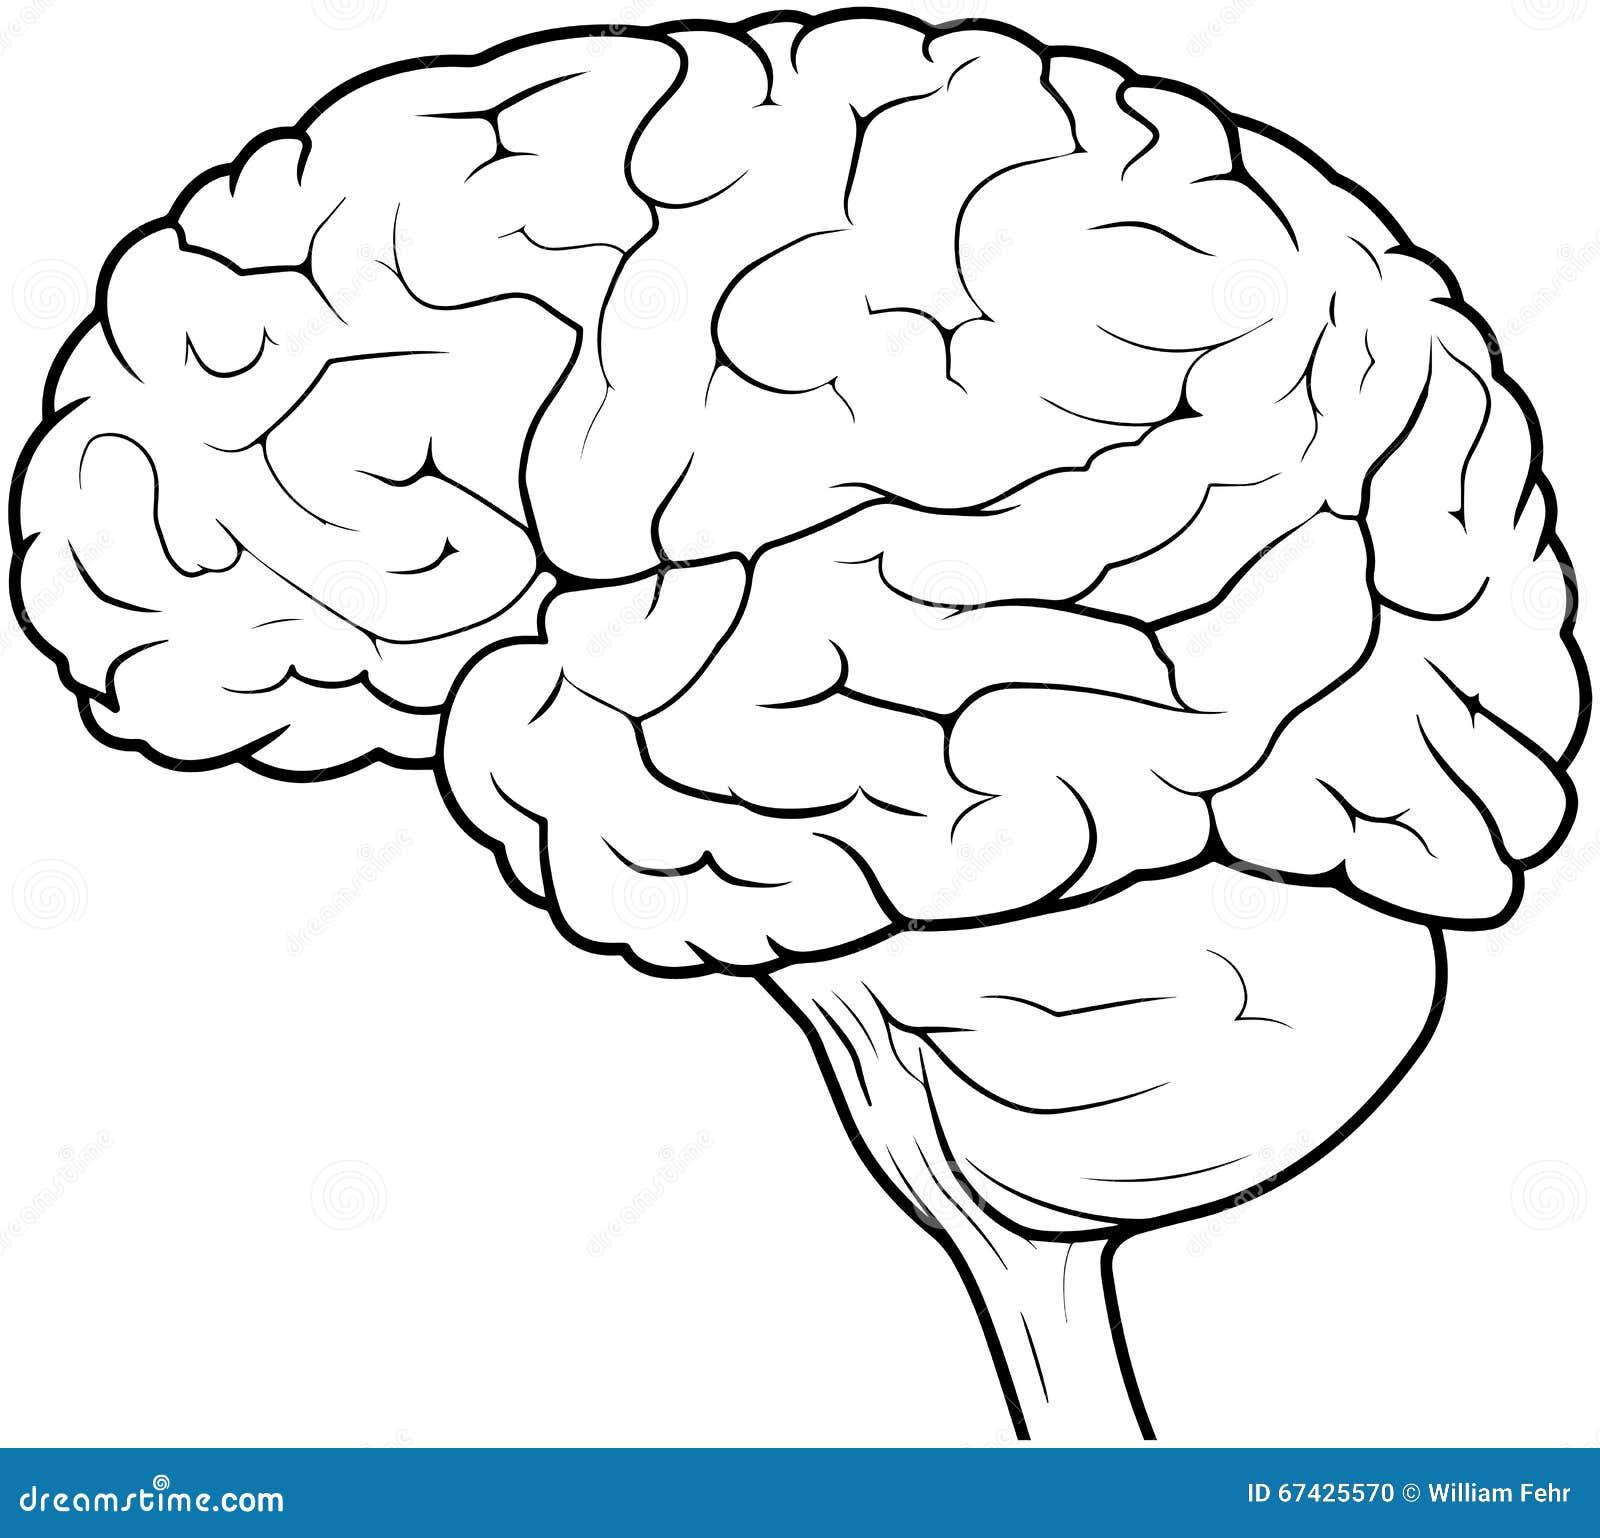 human brain drawing stock illustration  illustration of occipital